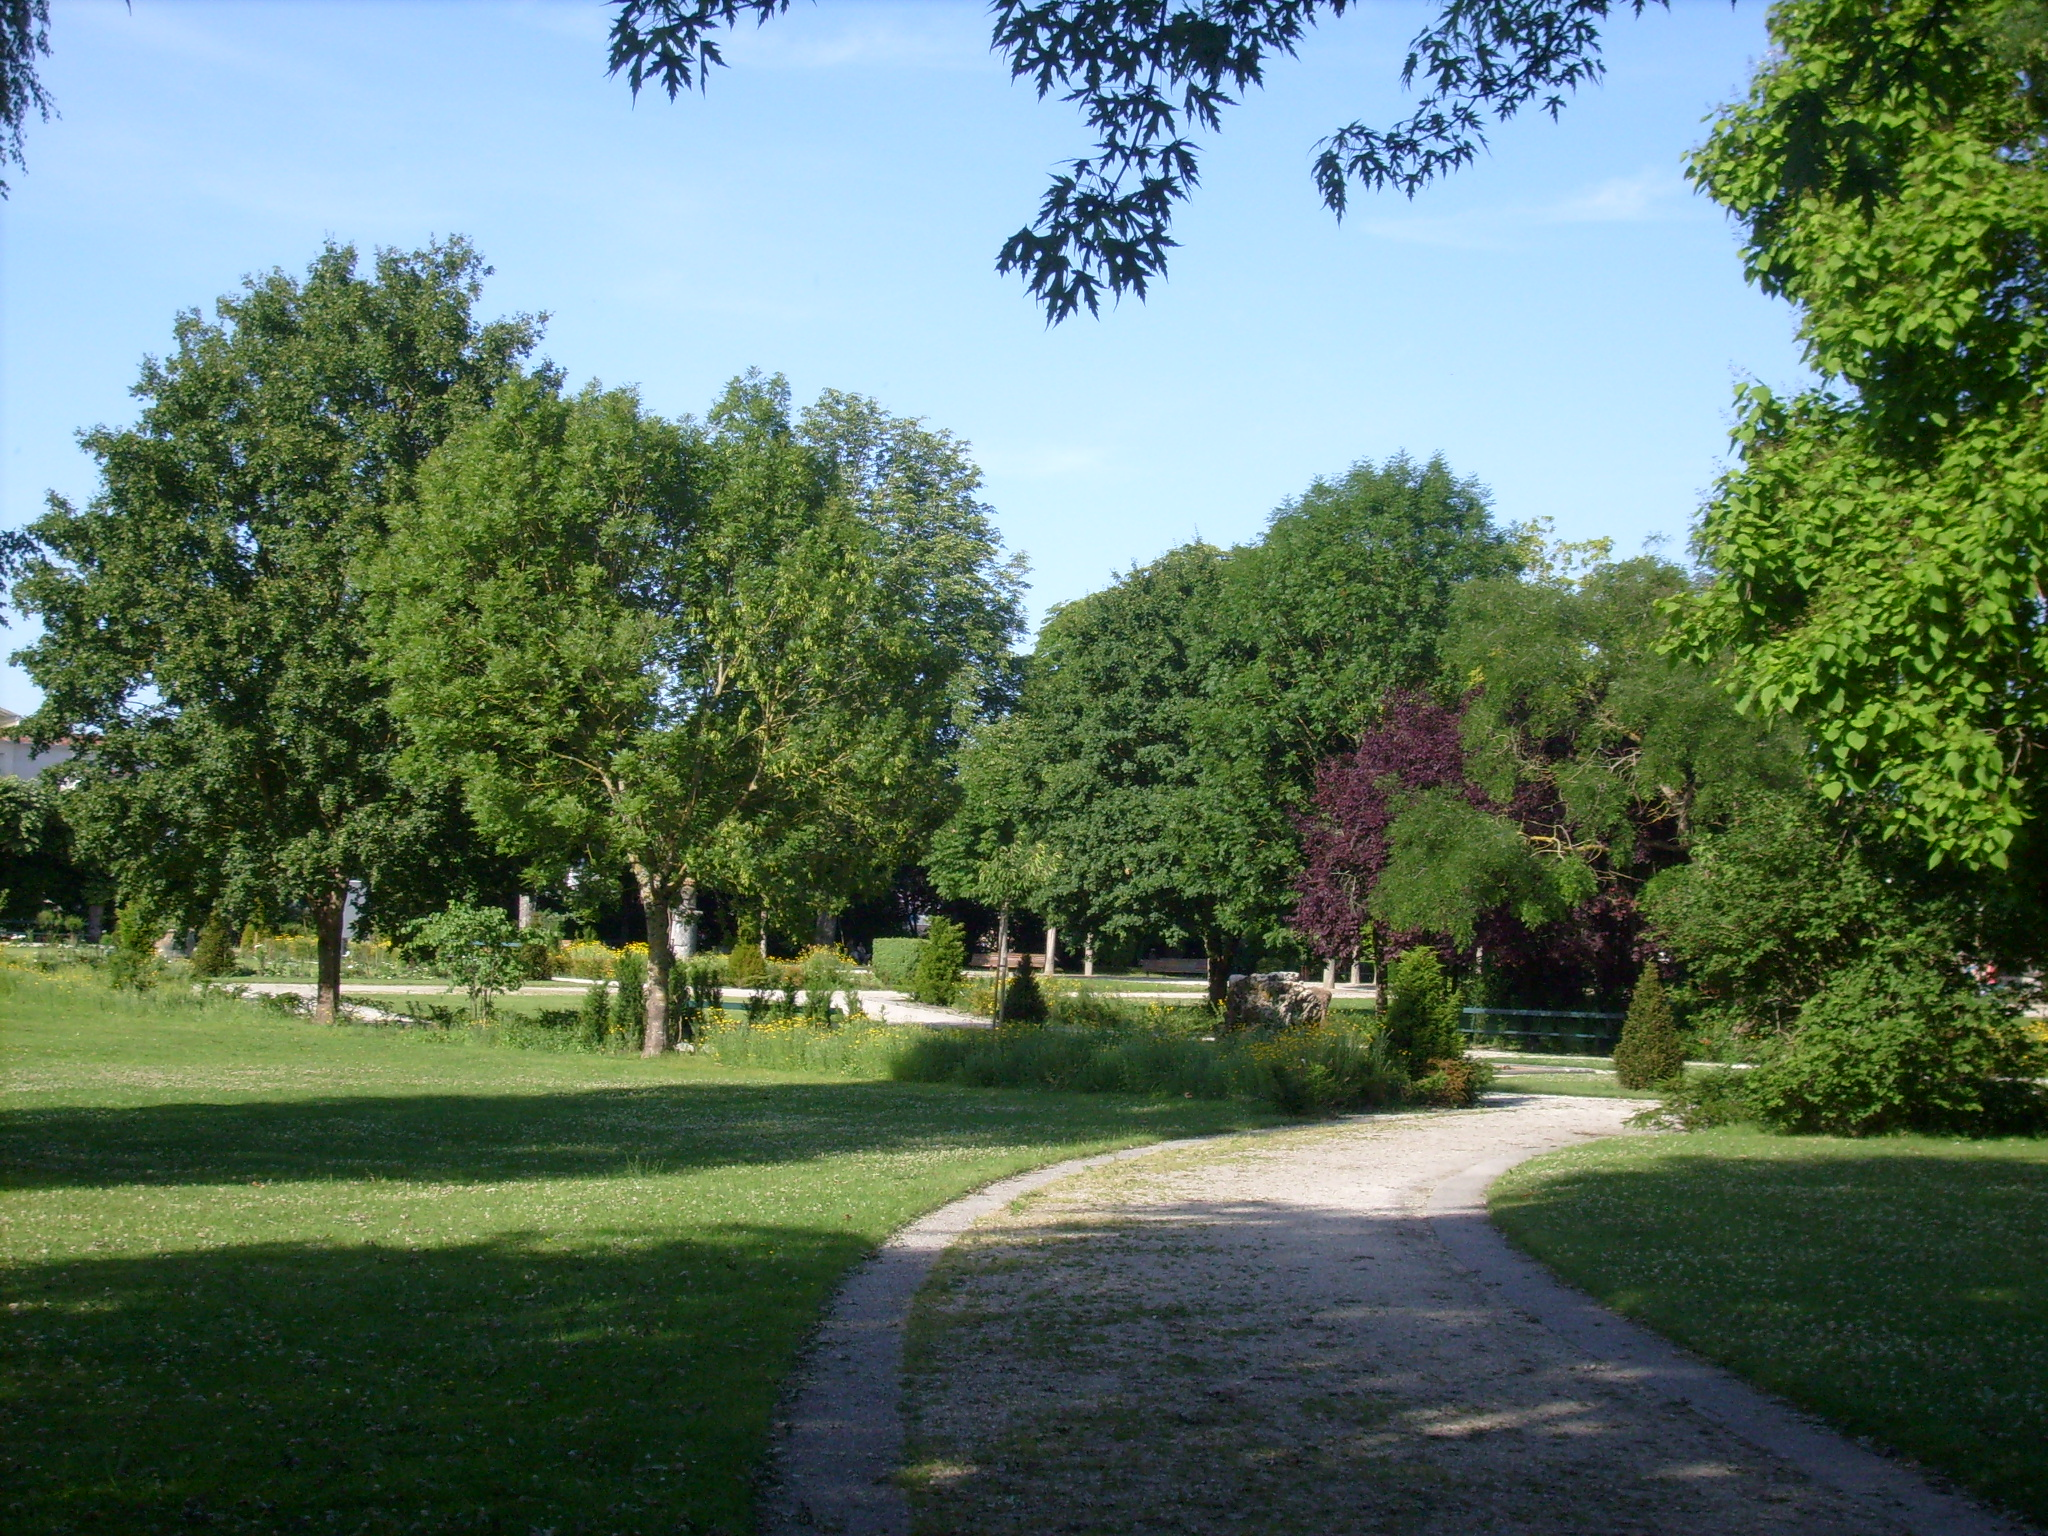 Fichier jardin public de saintes 2 jpg wikip dia for Jardin public